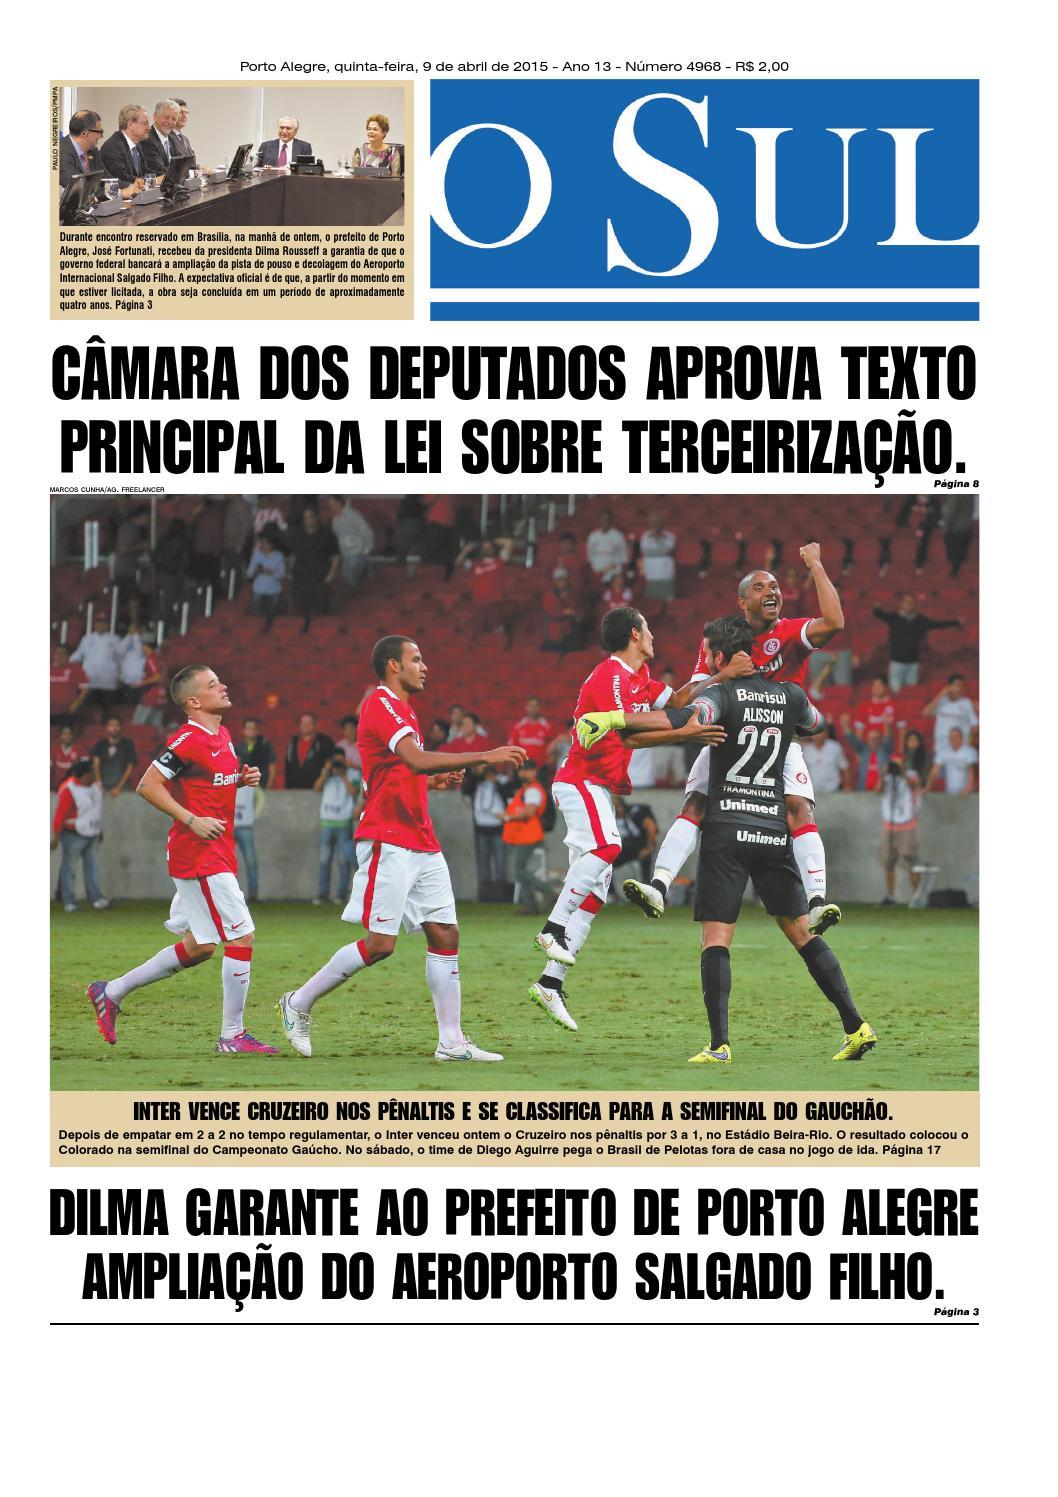 Jornal O Sul - 09 04 2015 by agadret - issuu 34b9d0461ca